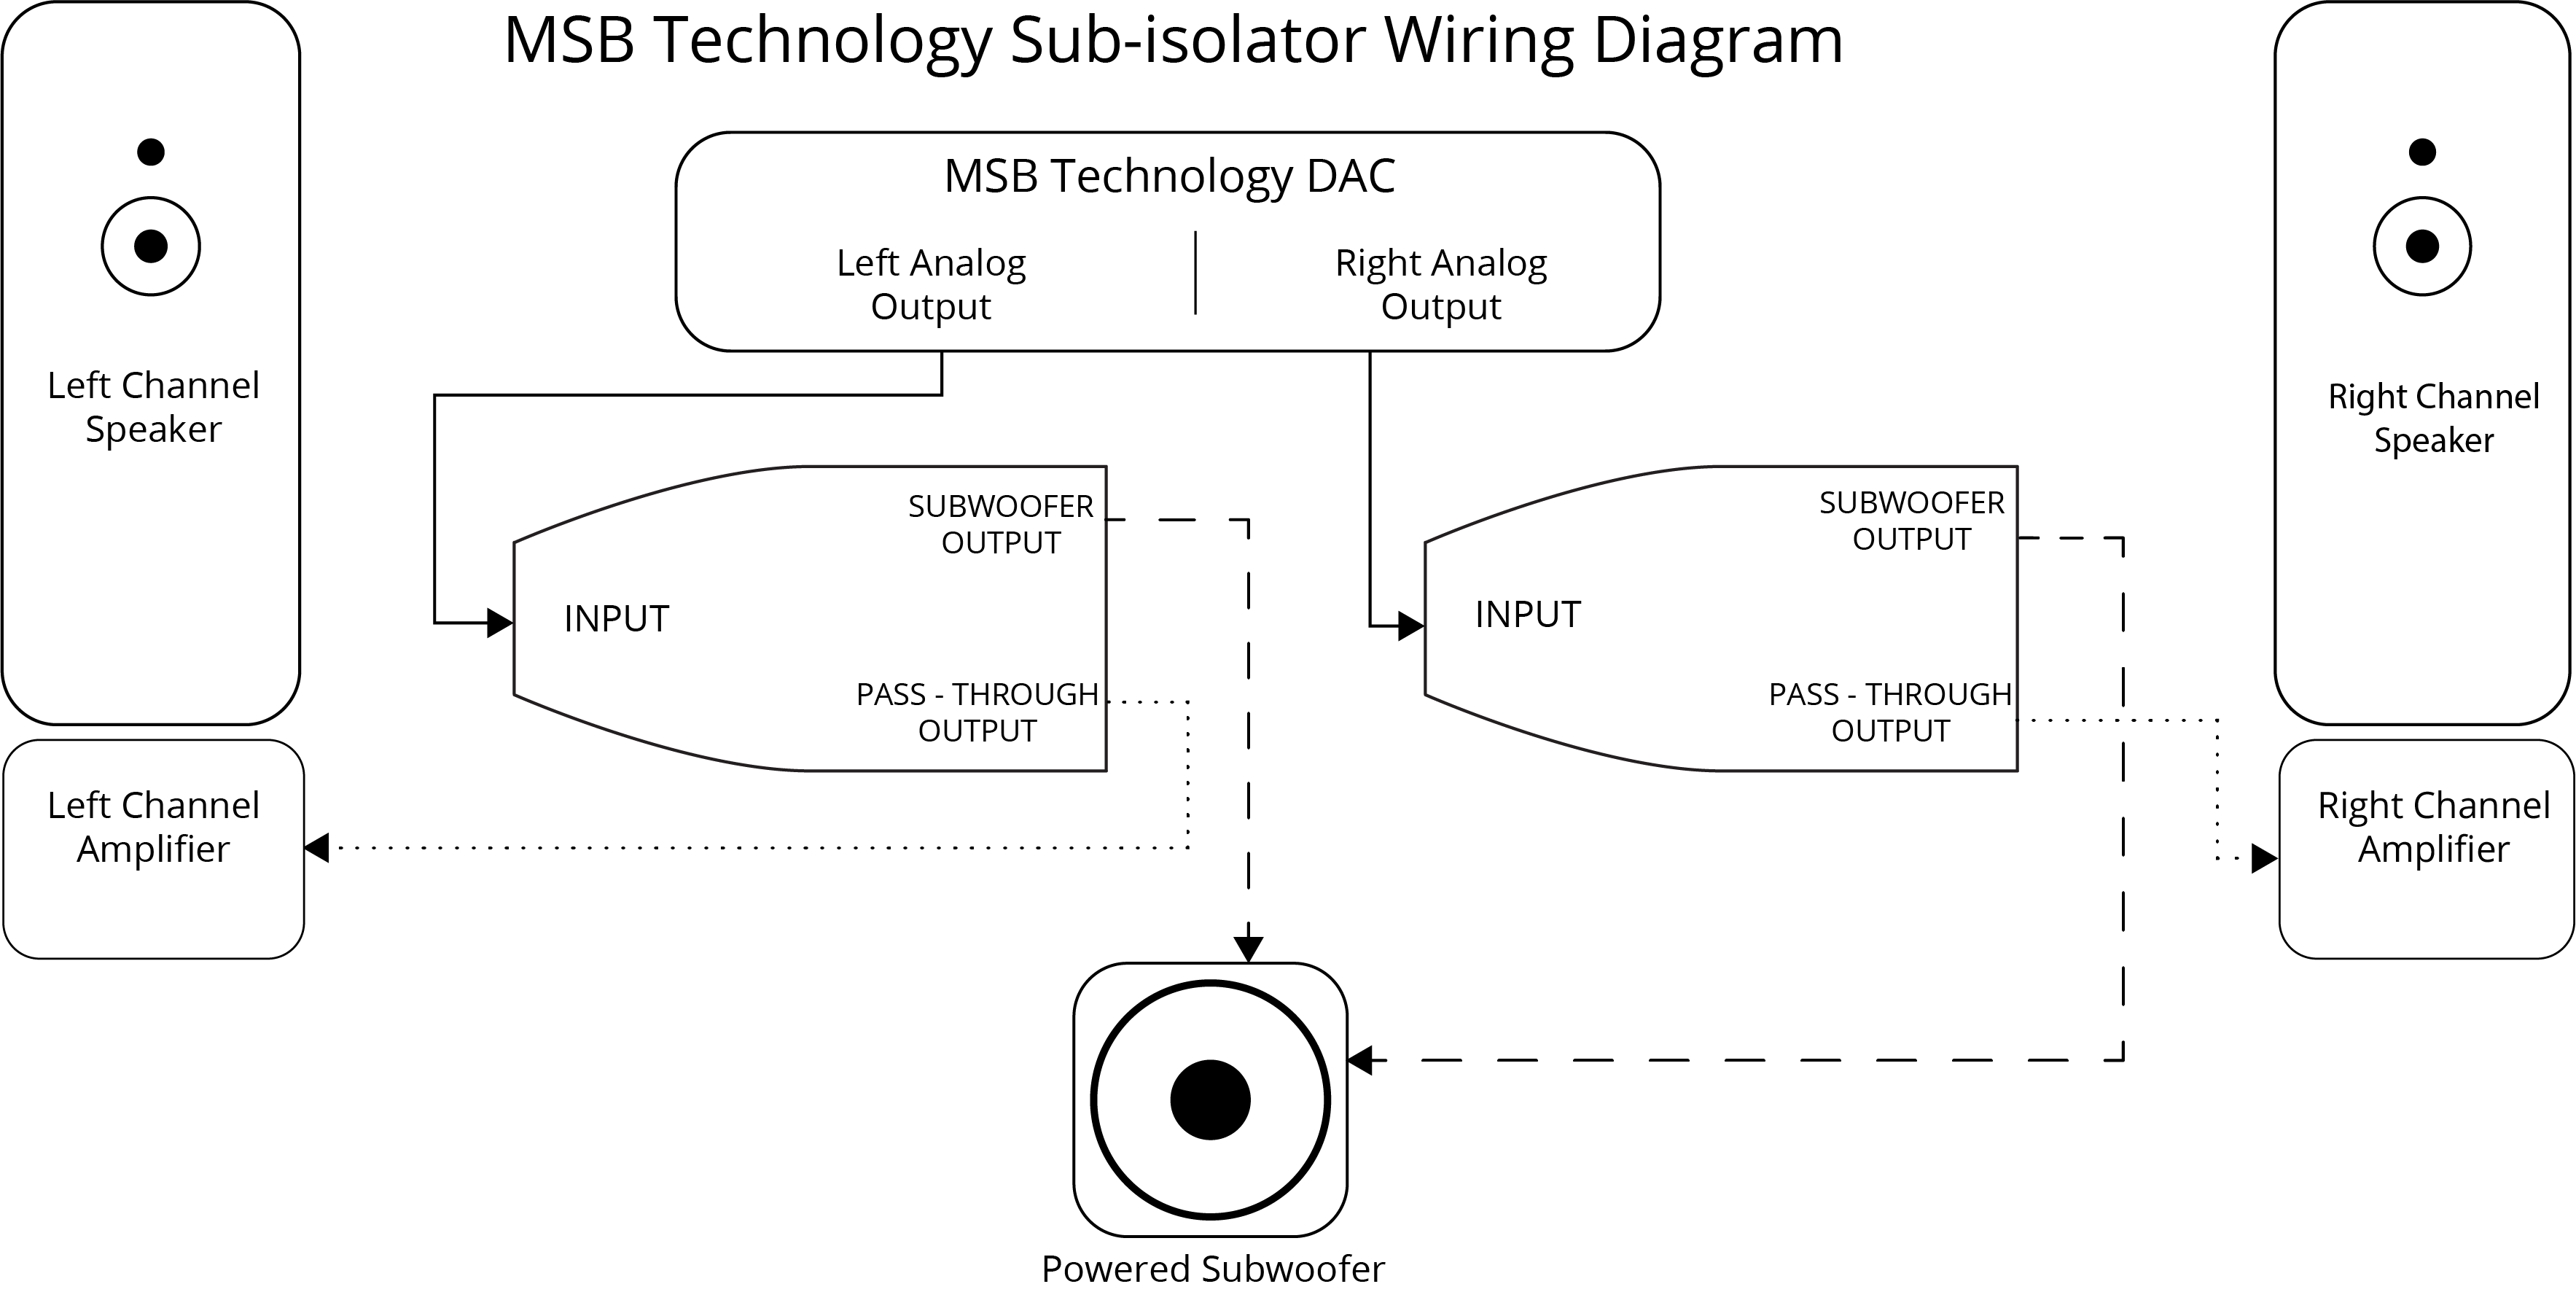 Powered Sub Wiring Diagram